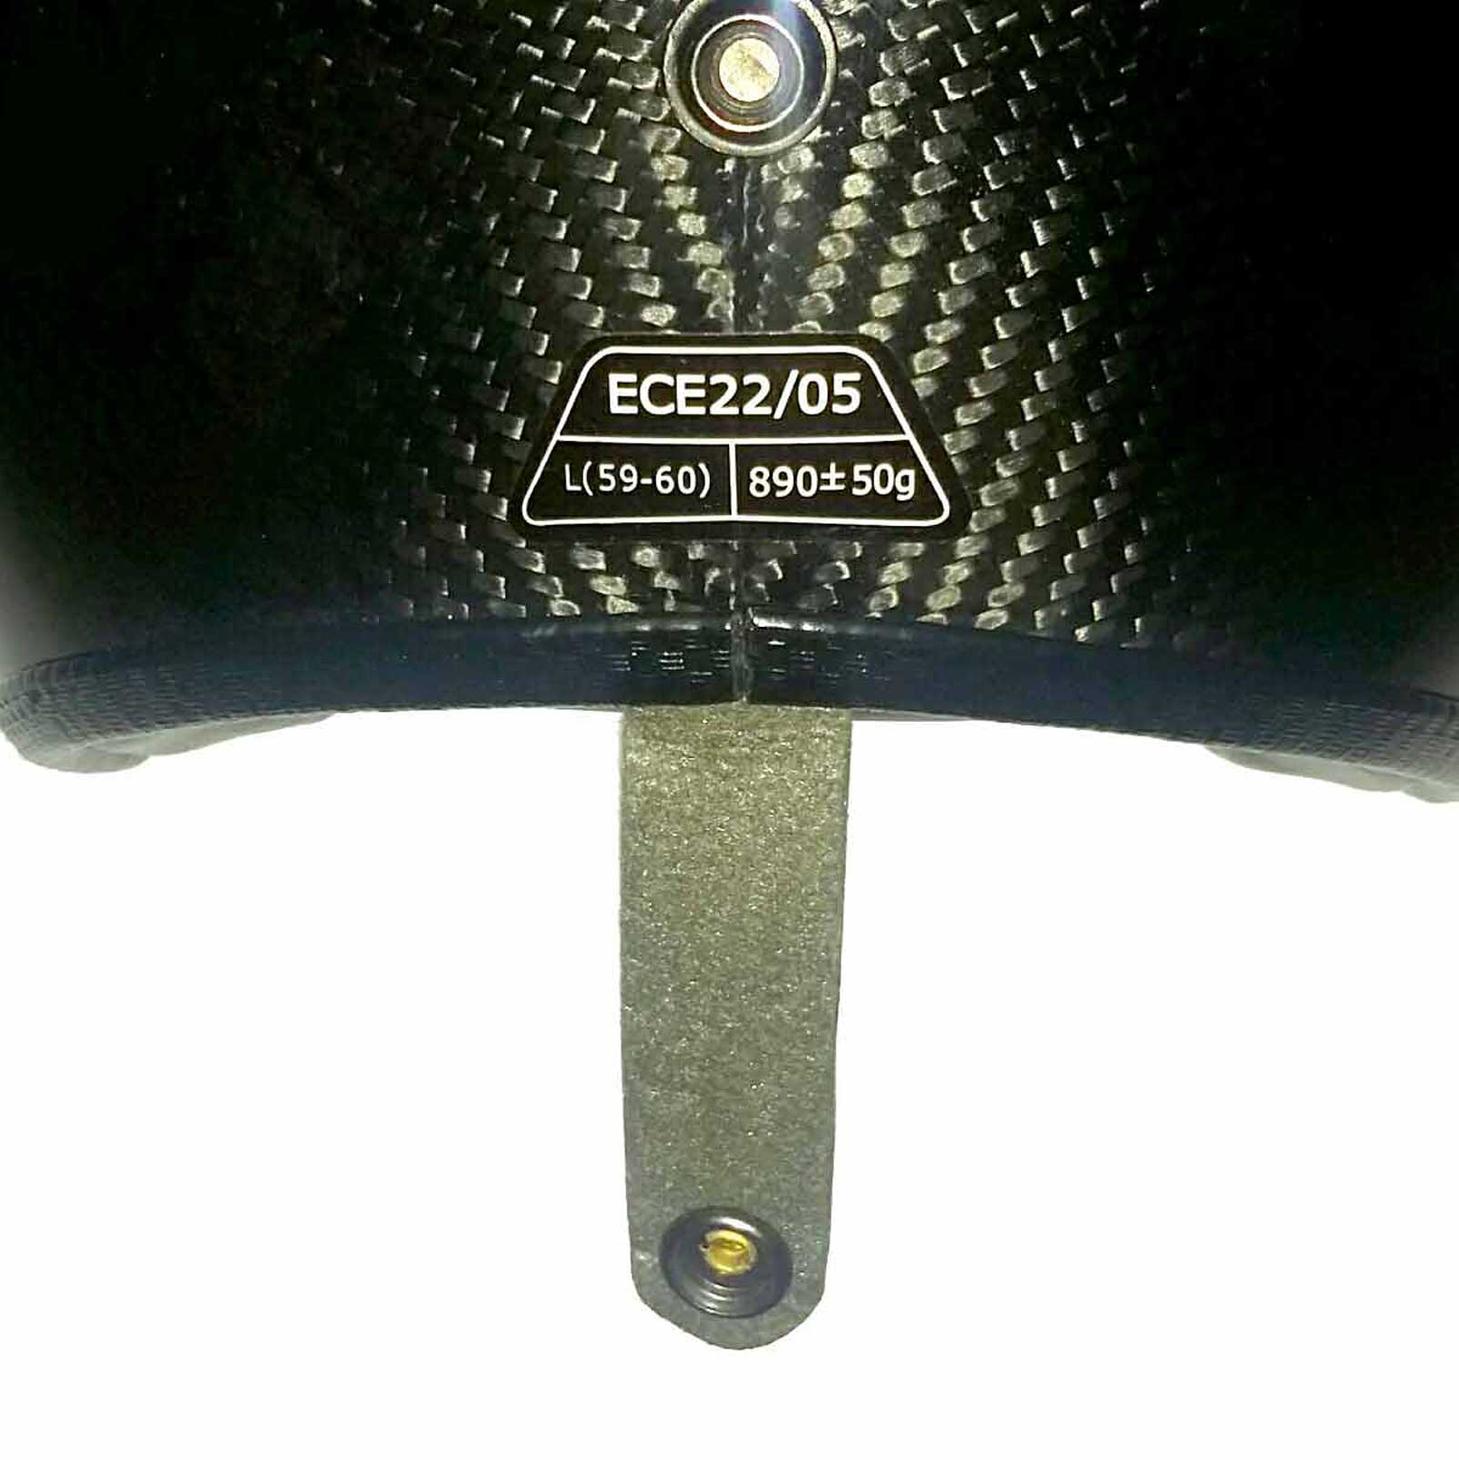 ECE-certified Carbon jet helmet by Bandit Helmets – Picture 4